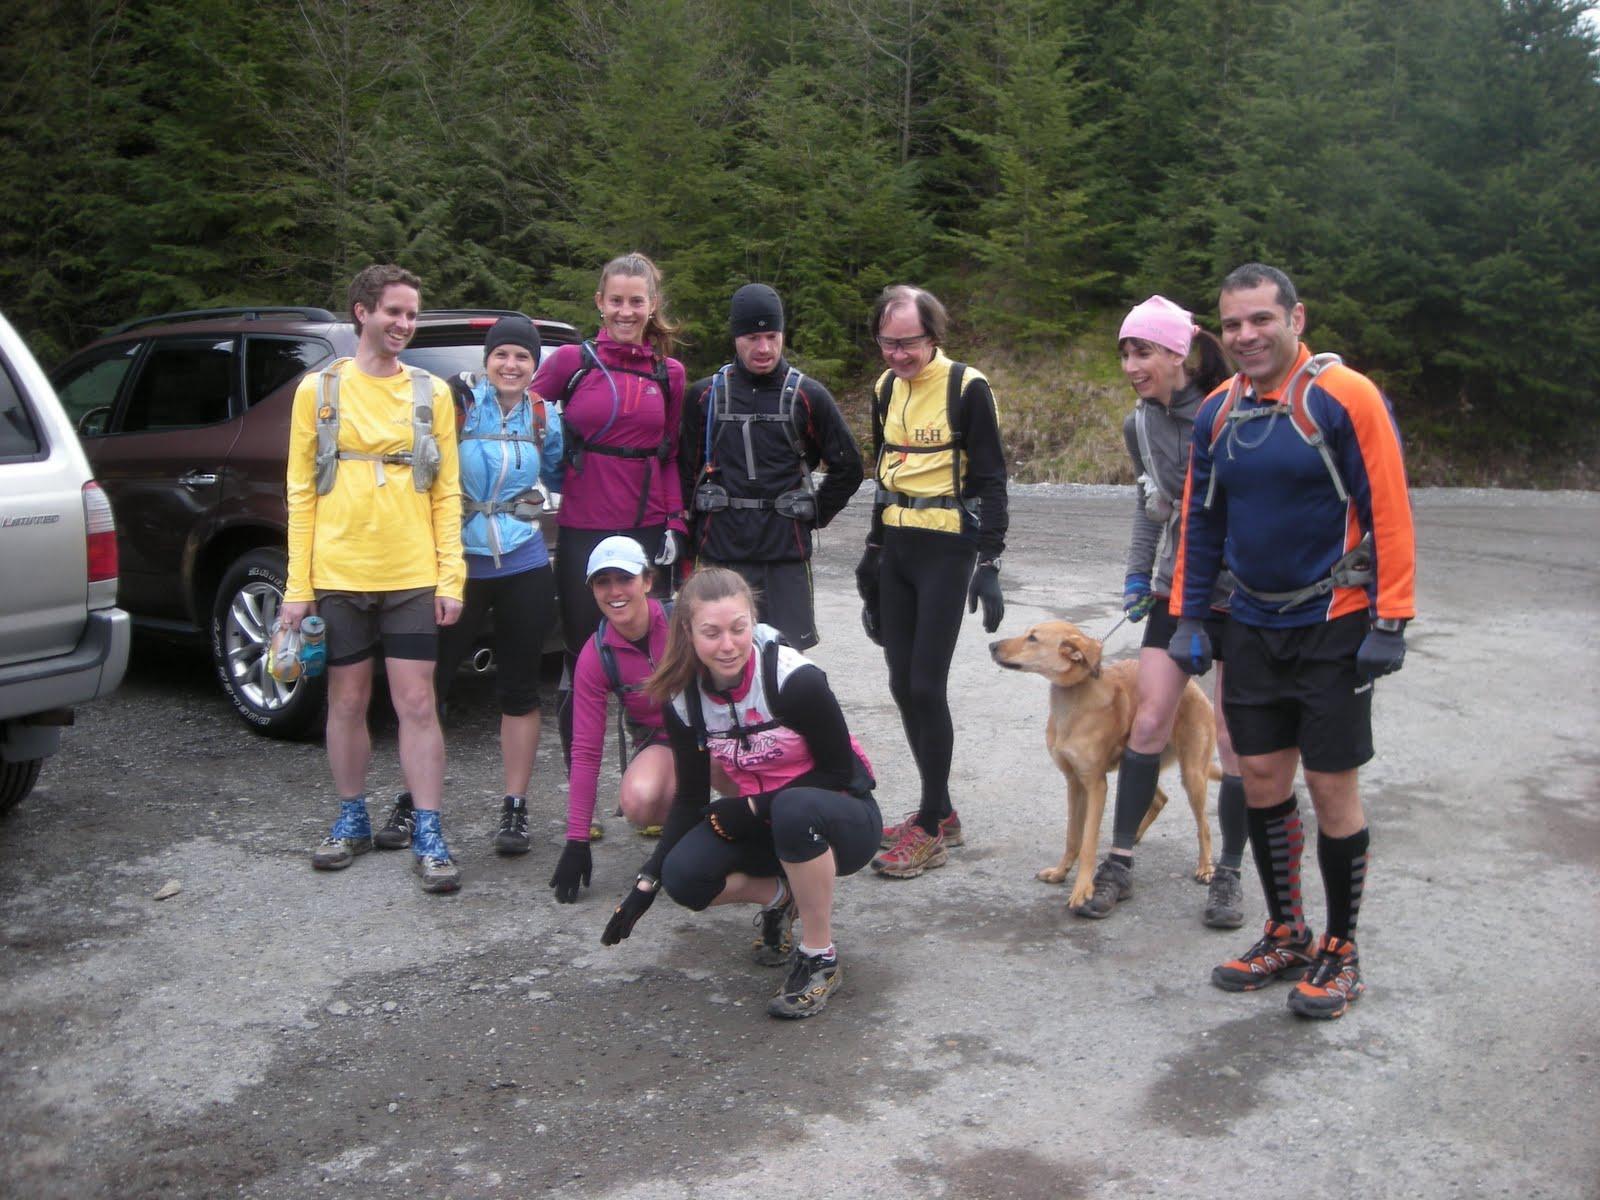 Some of the Training Run runners